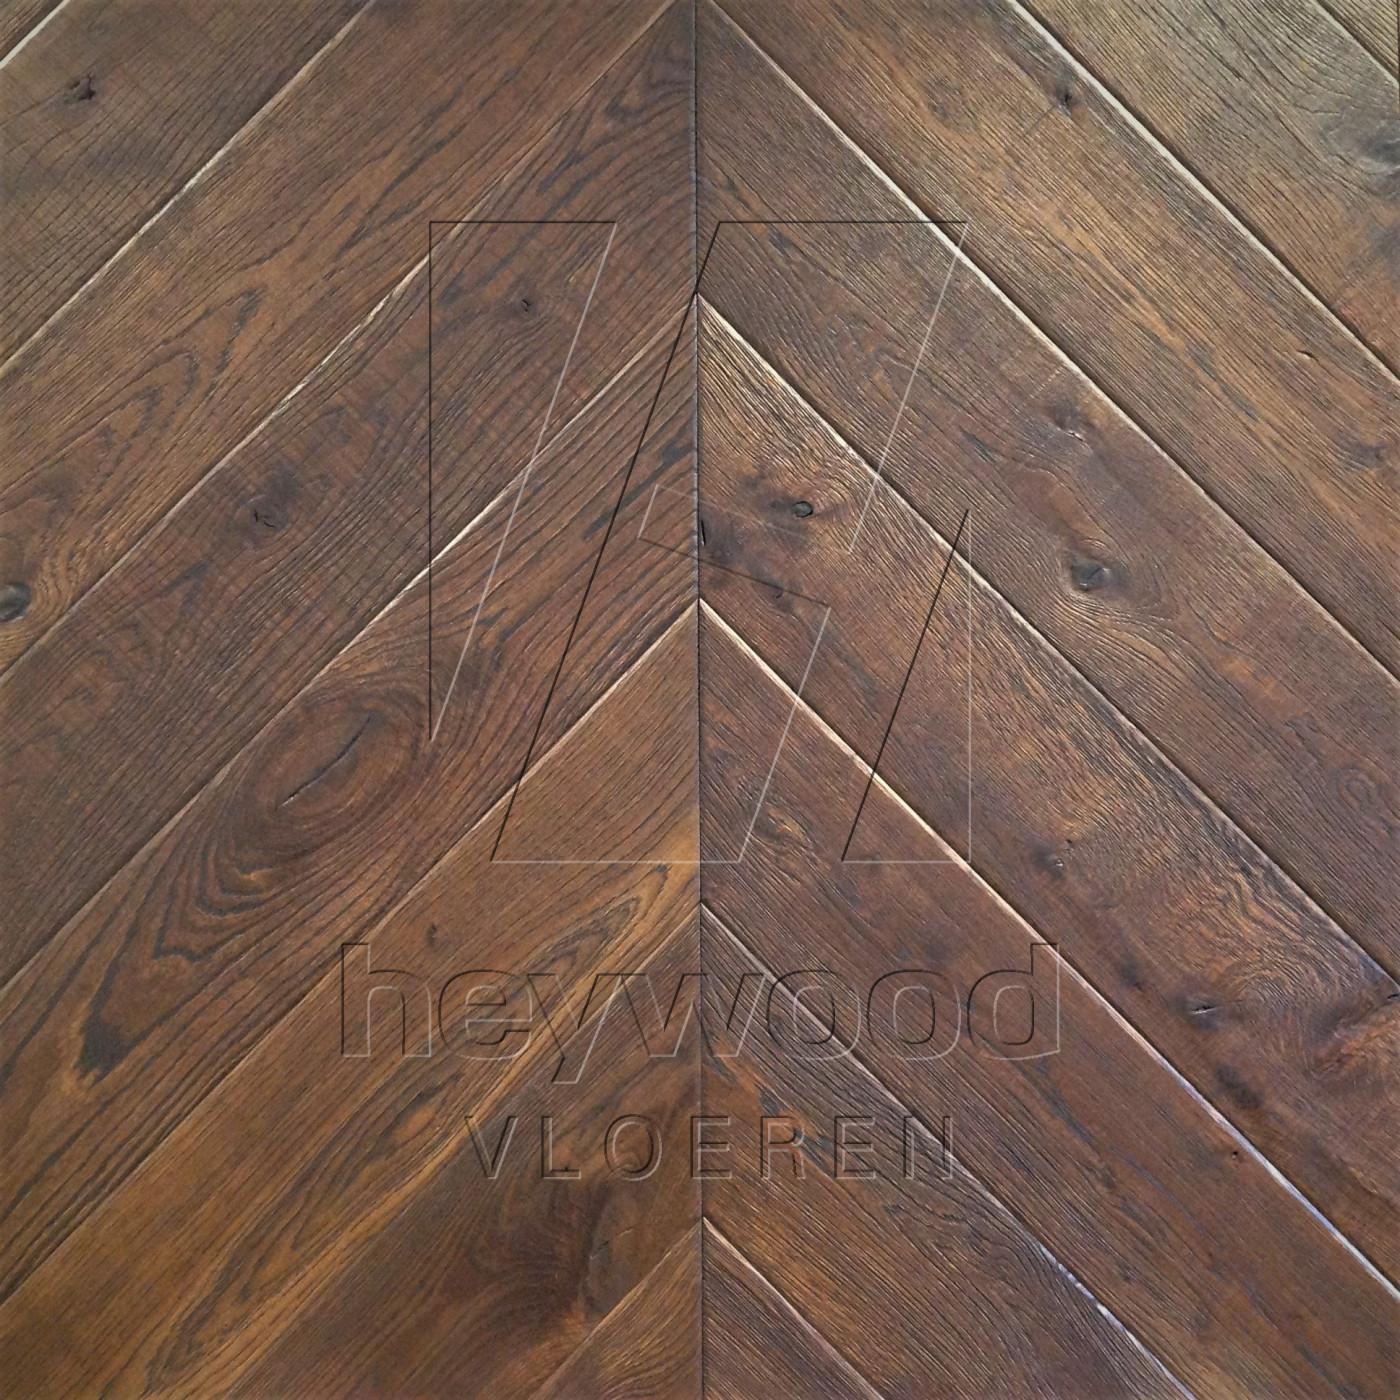 Knotting Hill Chevron 'Yorkshire' in Chevron of Pattern & Panel Floors